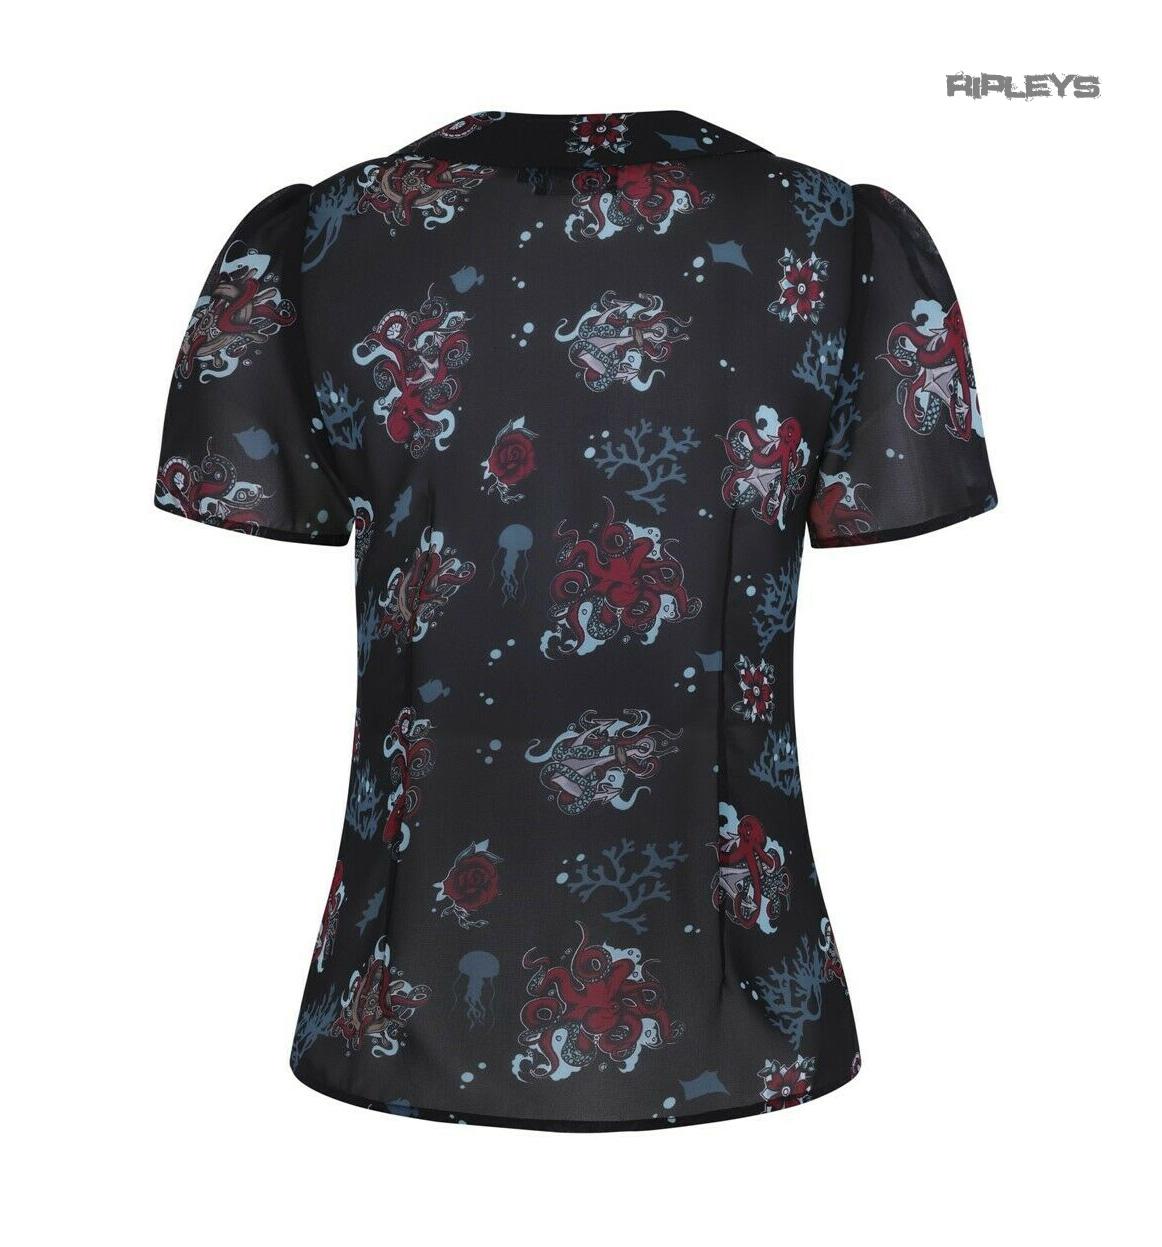 Hell-Bunny-50s-Shirt-Top-Black-Ocean-Octopus-Roses-POSEIDON-Blouse-All-Sizes thumbnail 36